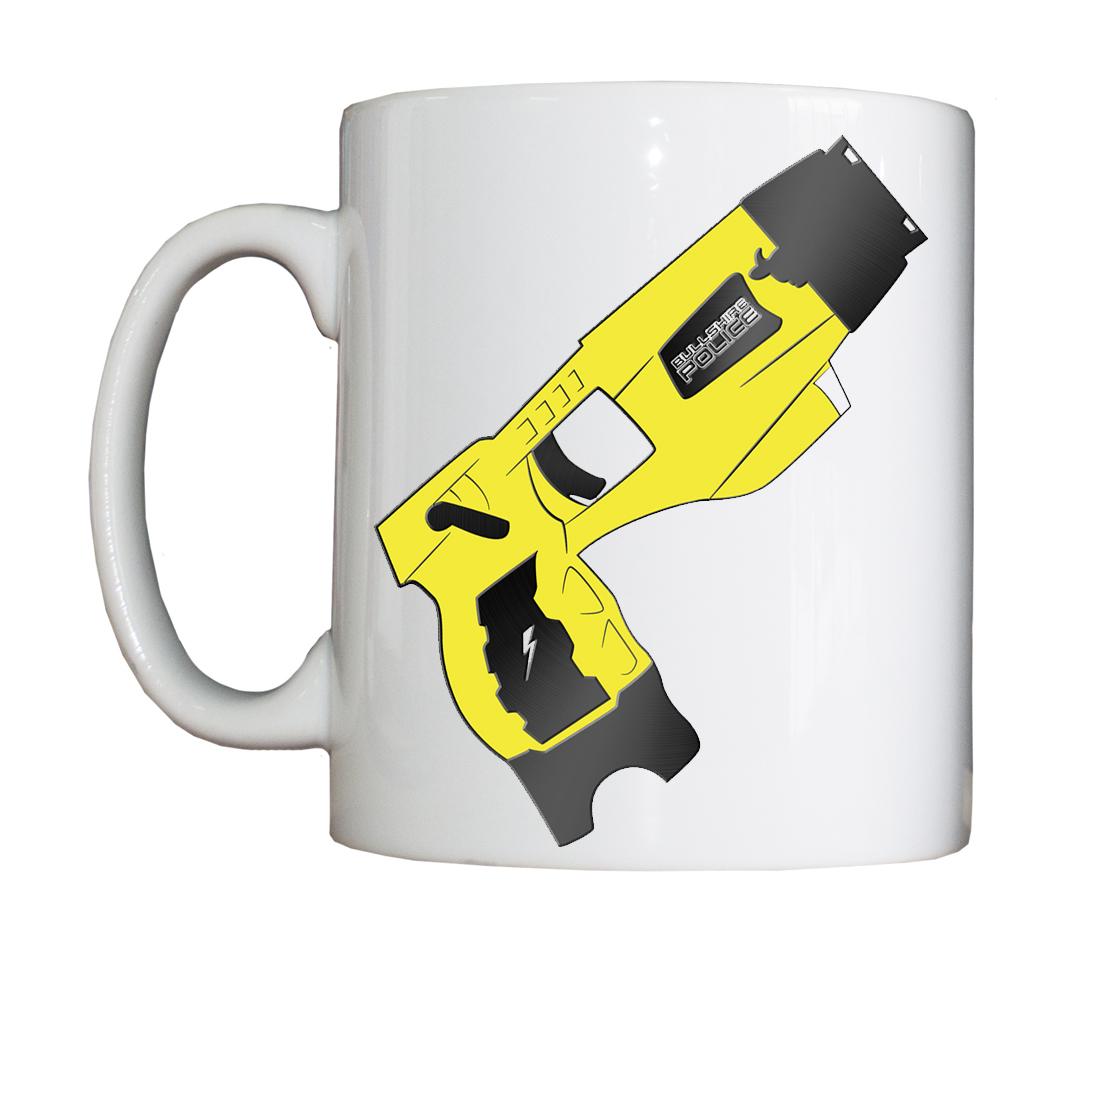 Personalised 'Bzzz' Drinking Vessel (Mug) BzzzMugTASER